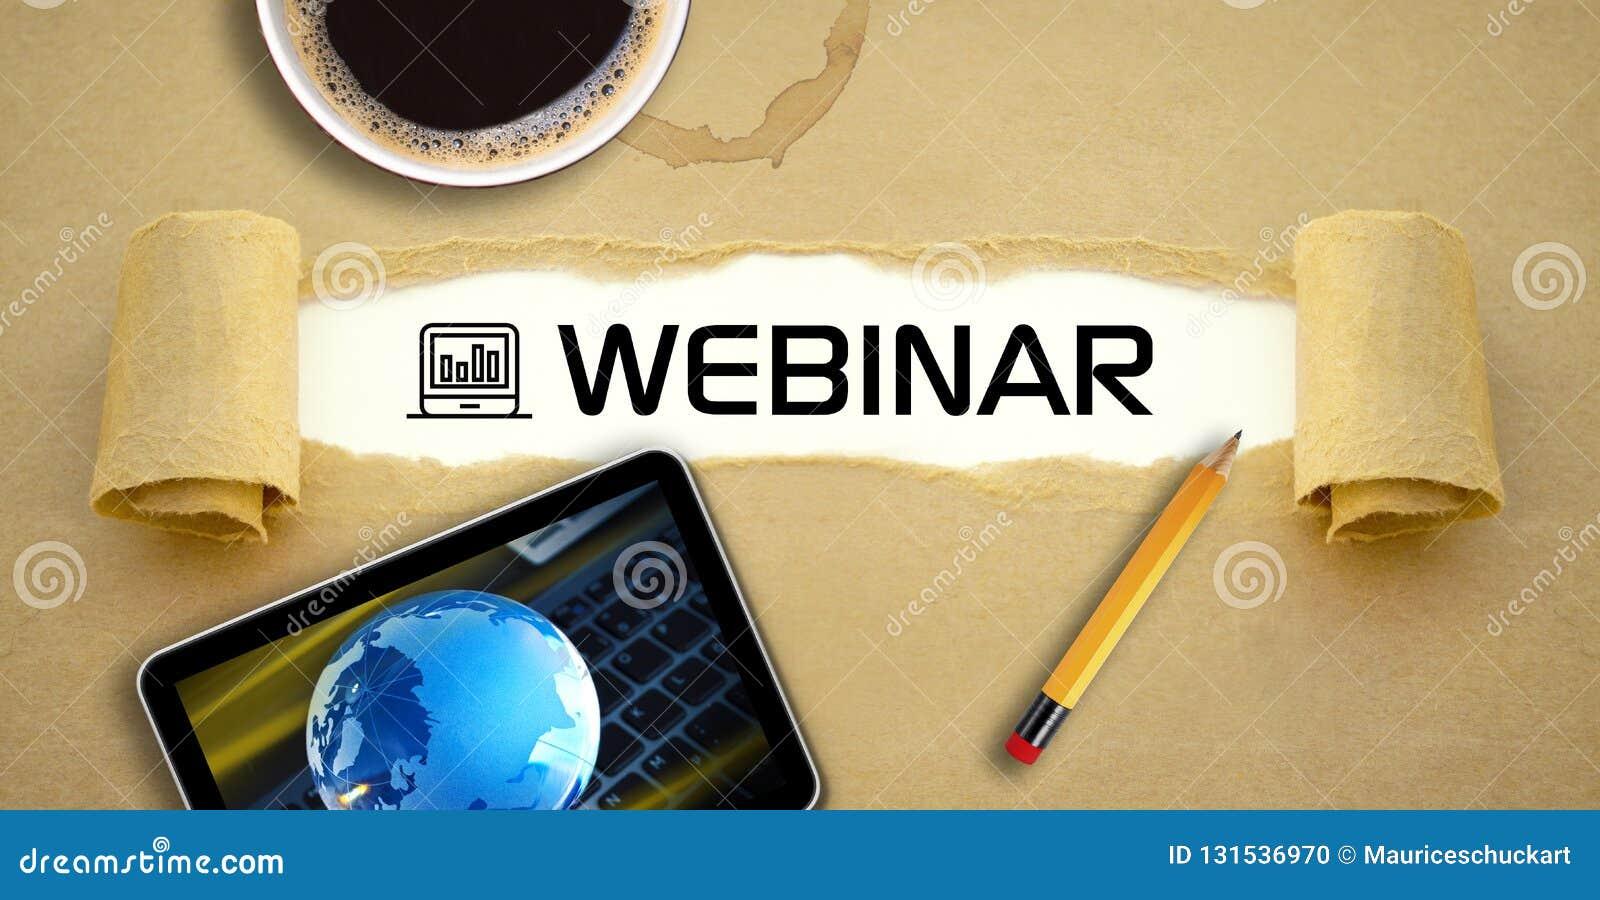 Курс обучения по Интернету webinar онлайн уча онлайн